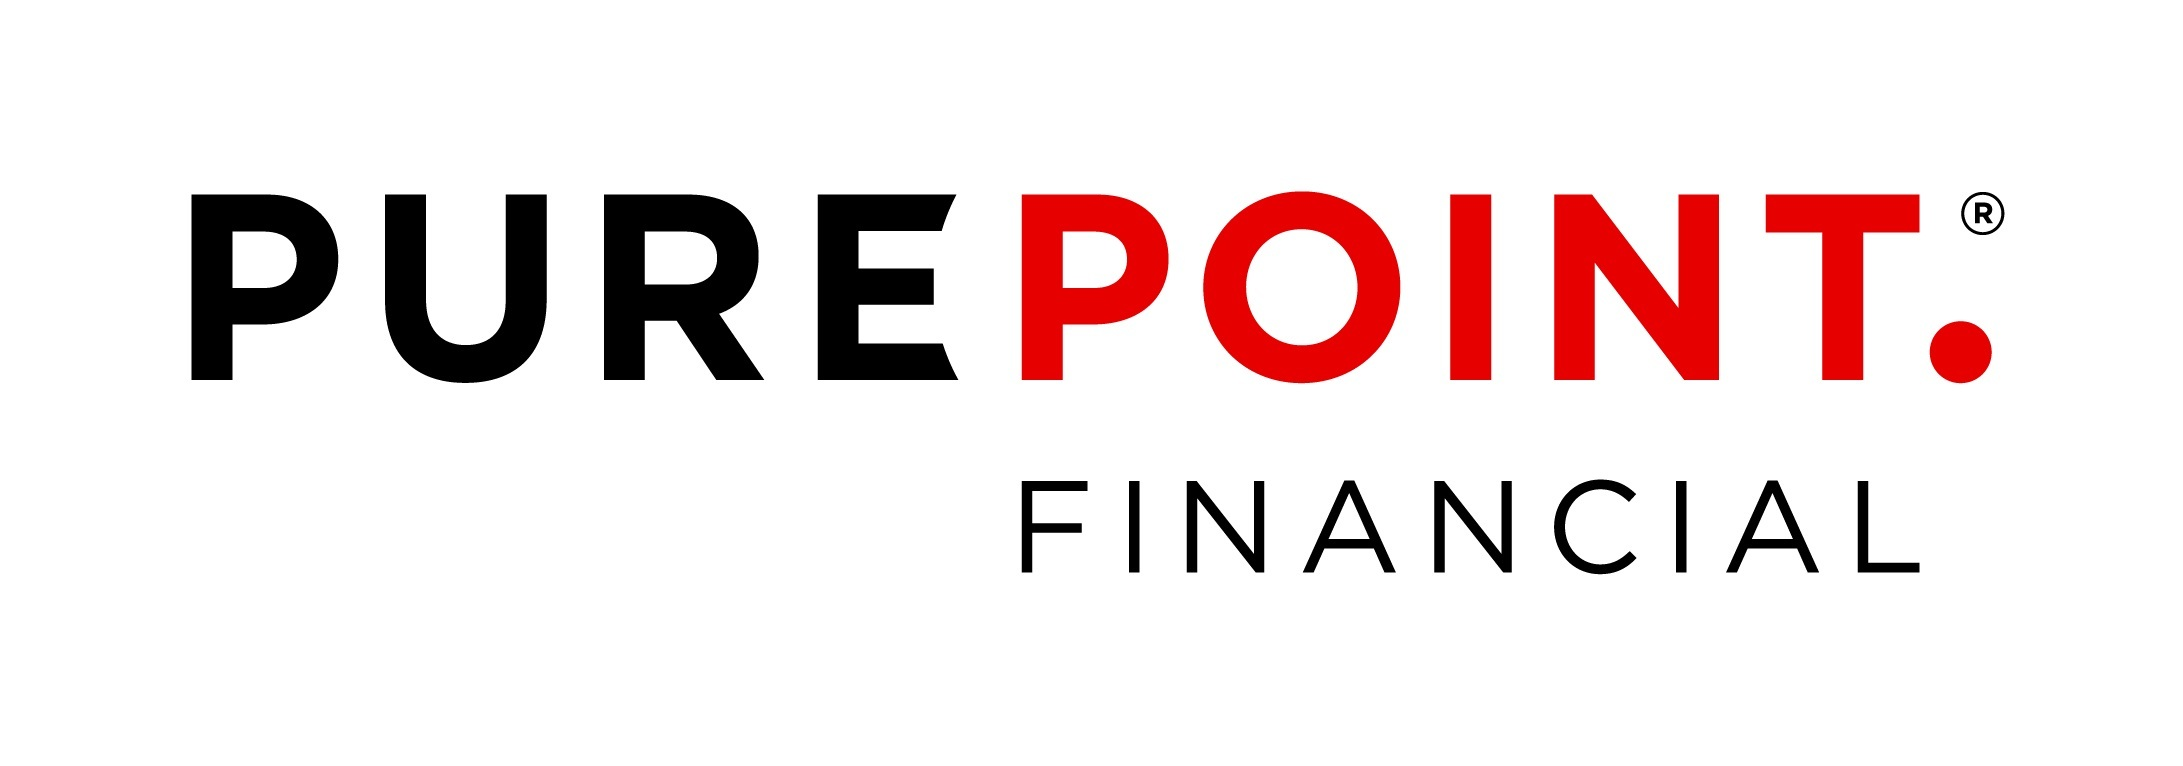 (PRNewsfoto/PurePoint Financial)